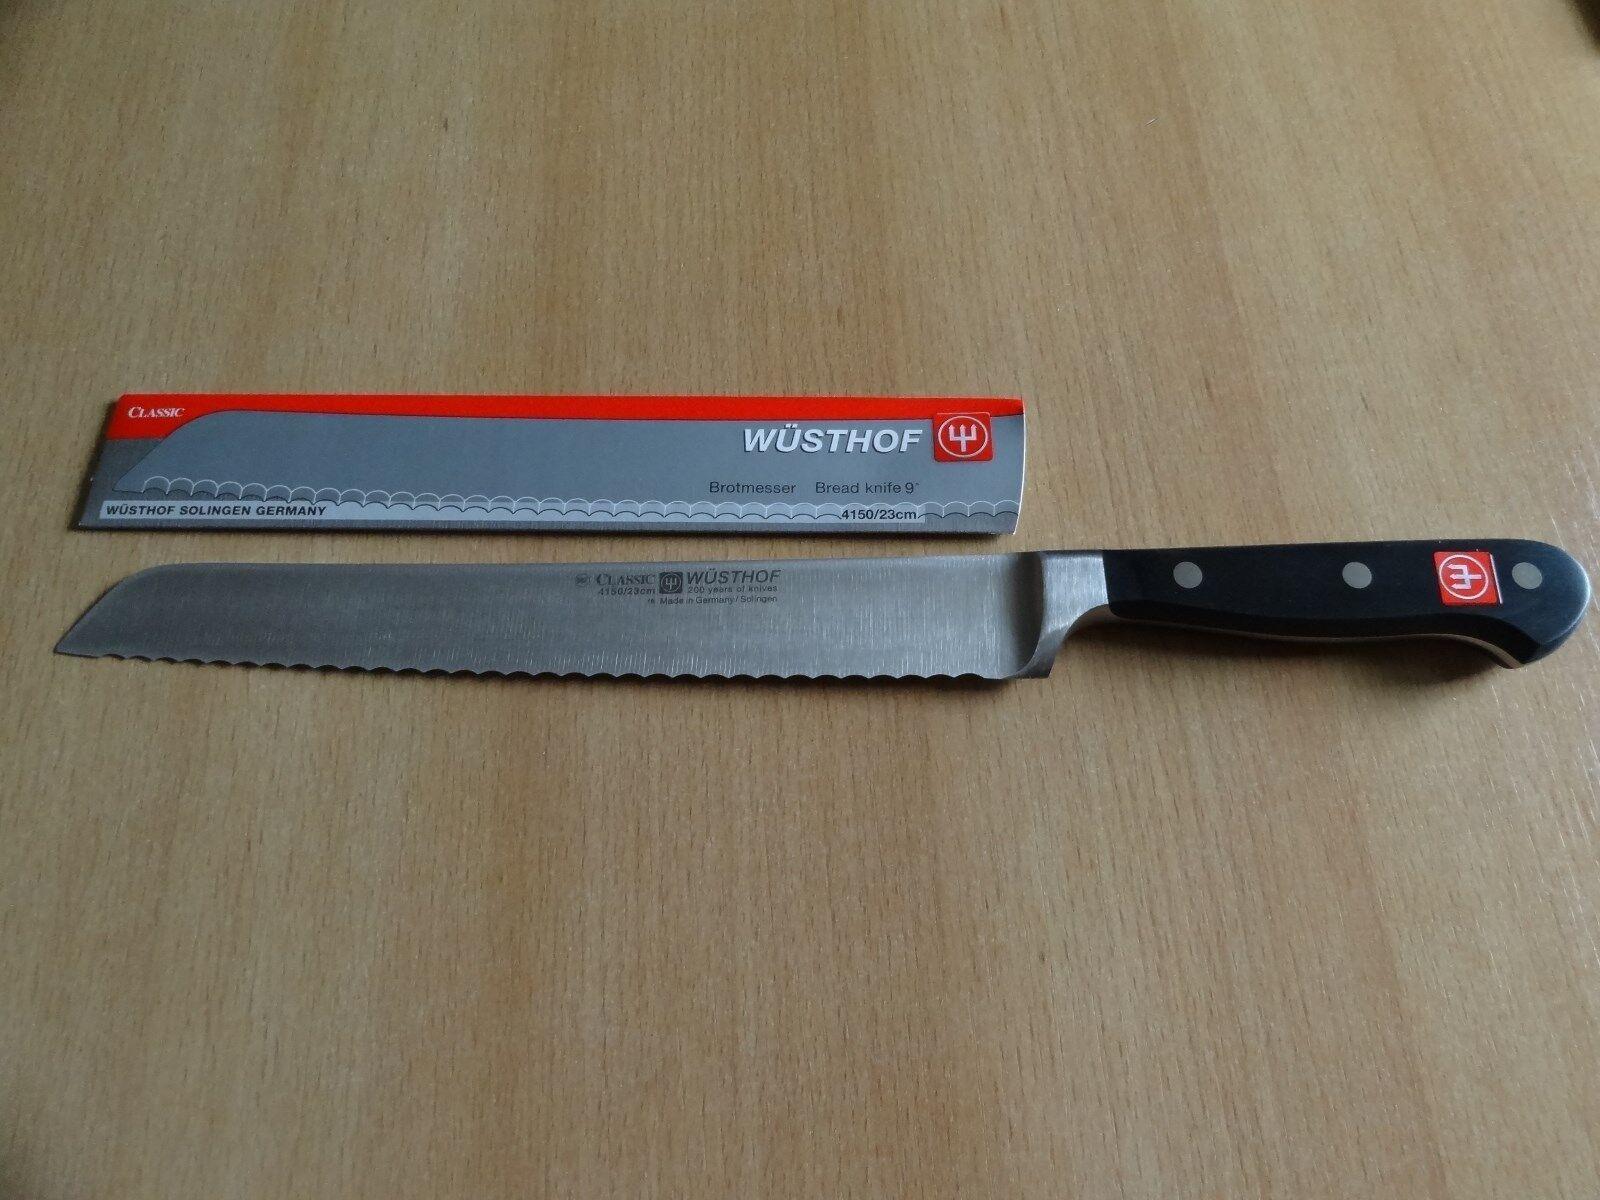 COLTELLO pane Classic wüsthof tridente fabbrica lame lunghezza 23cm 4150 23 BREAD KNIFE